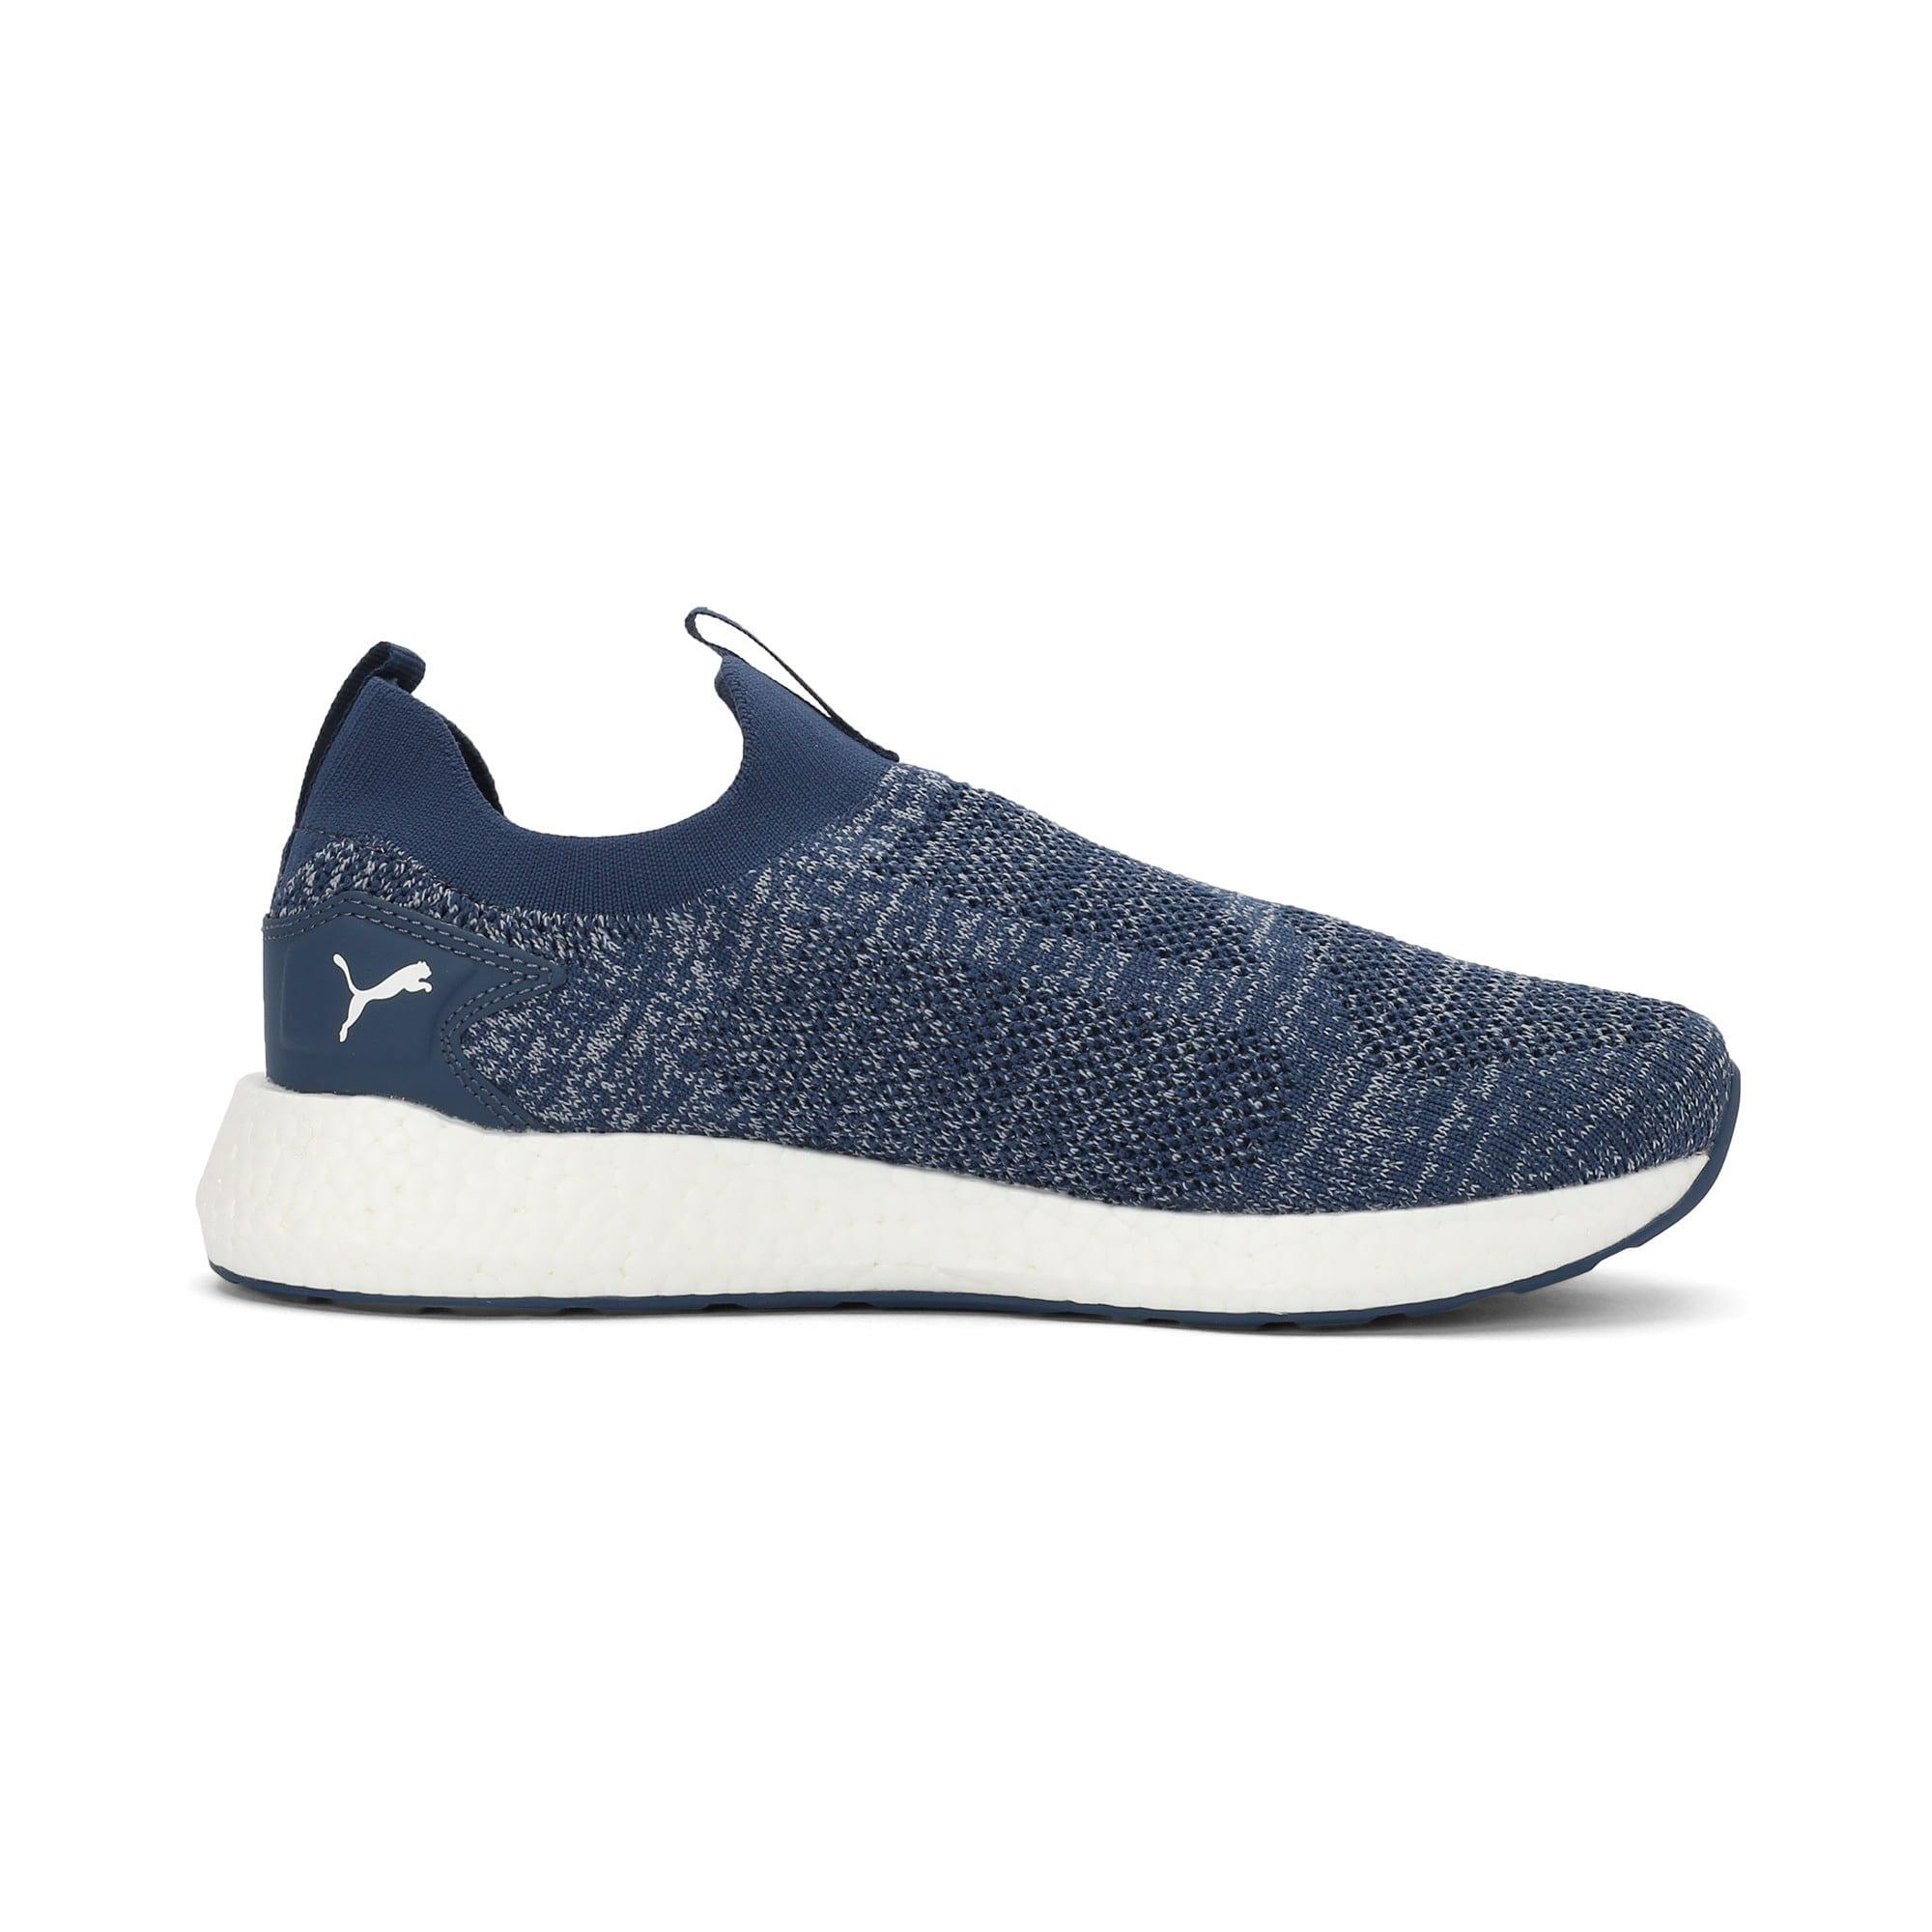 Thumbnail 5 of NRGY Neko Slip-On one8 Unisex Running Shoes, Dark Denim-Puma White, medium-IND